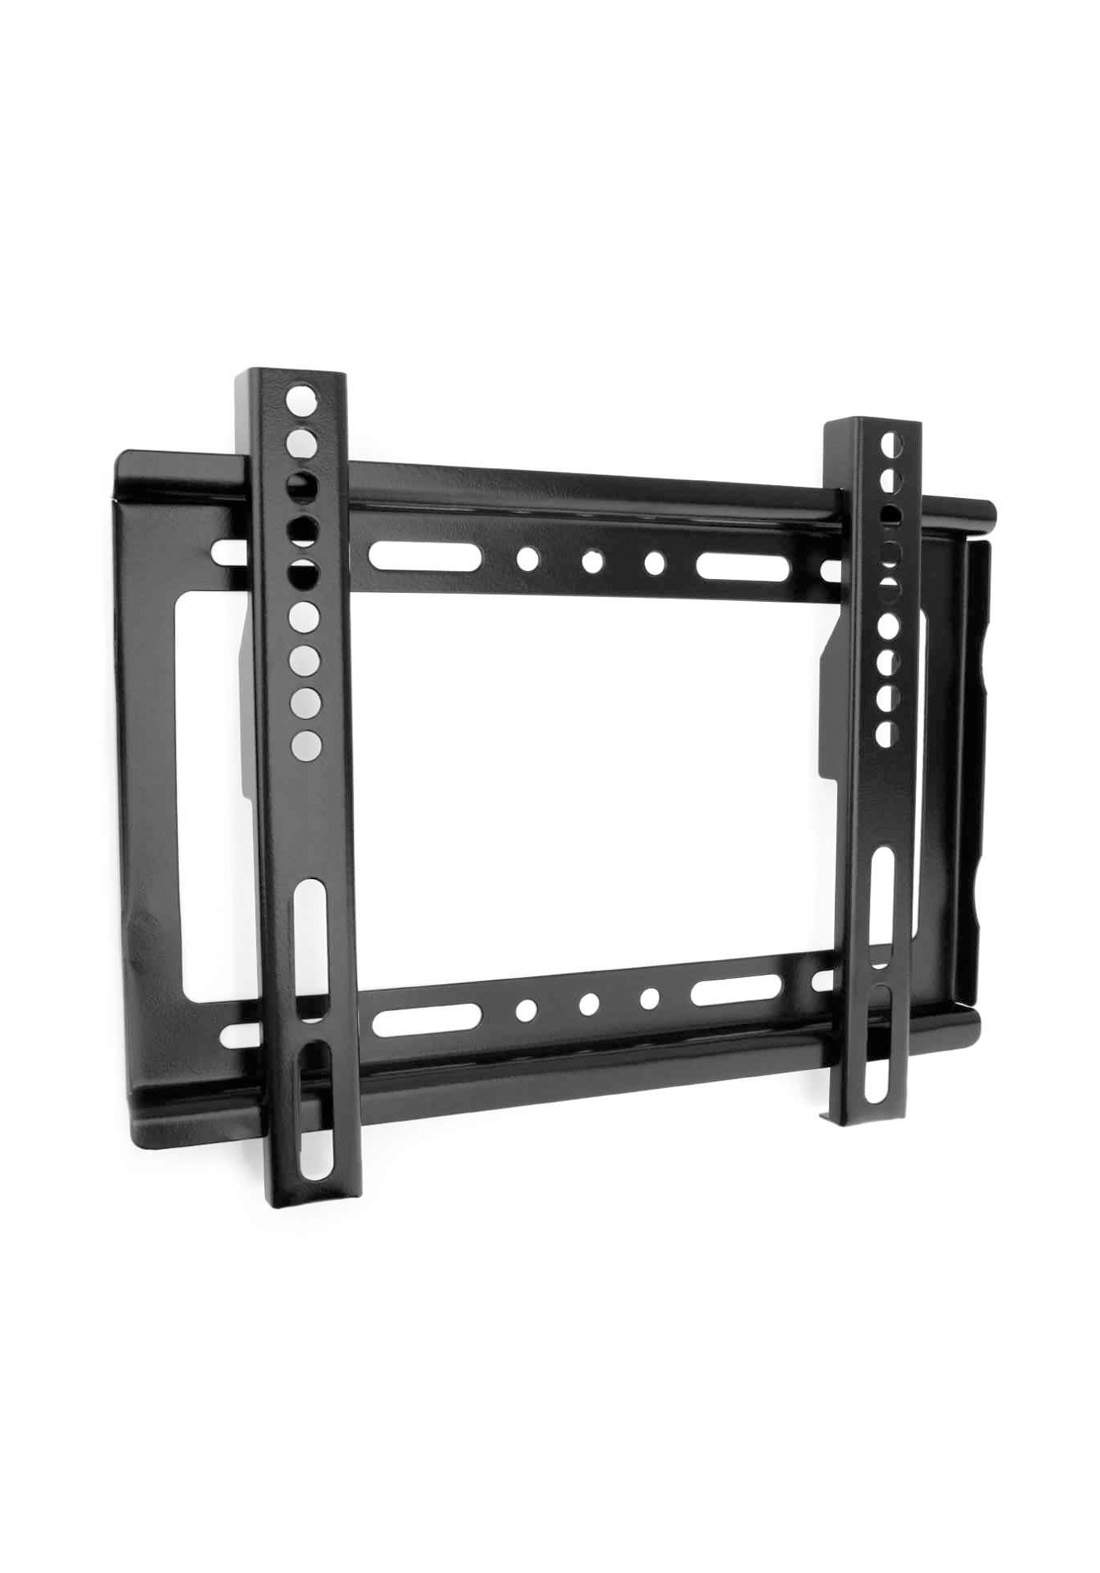 Flat-Screen TV Wall Mount 14 - 42 Inch حاملة تلفزيون للحائط ثابت